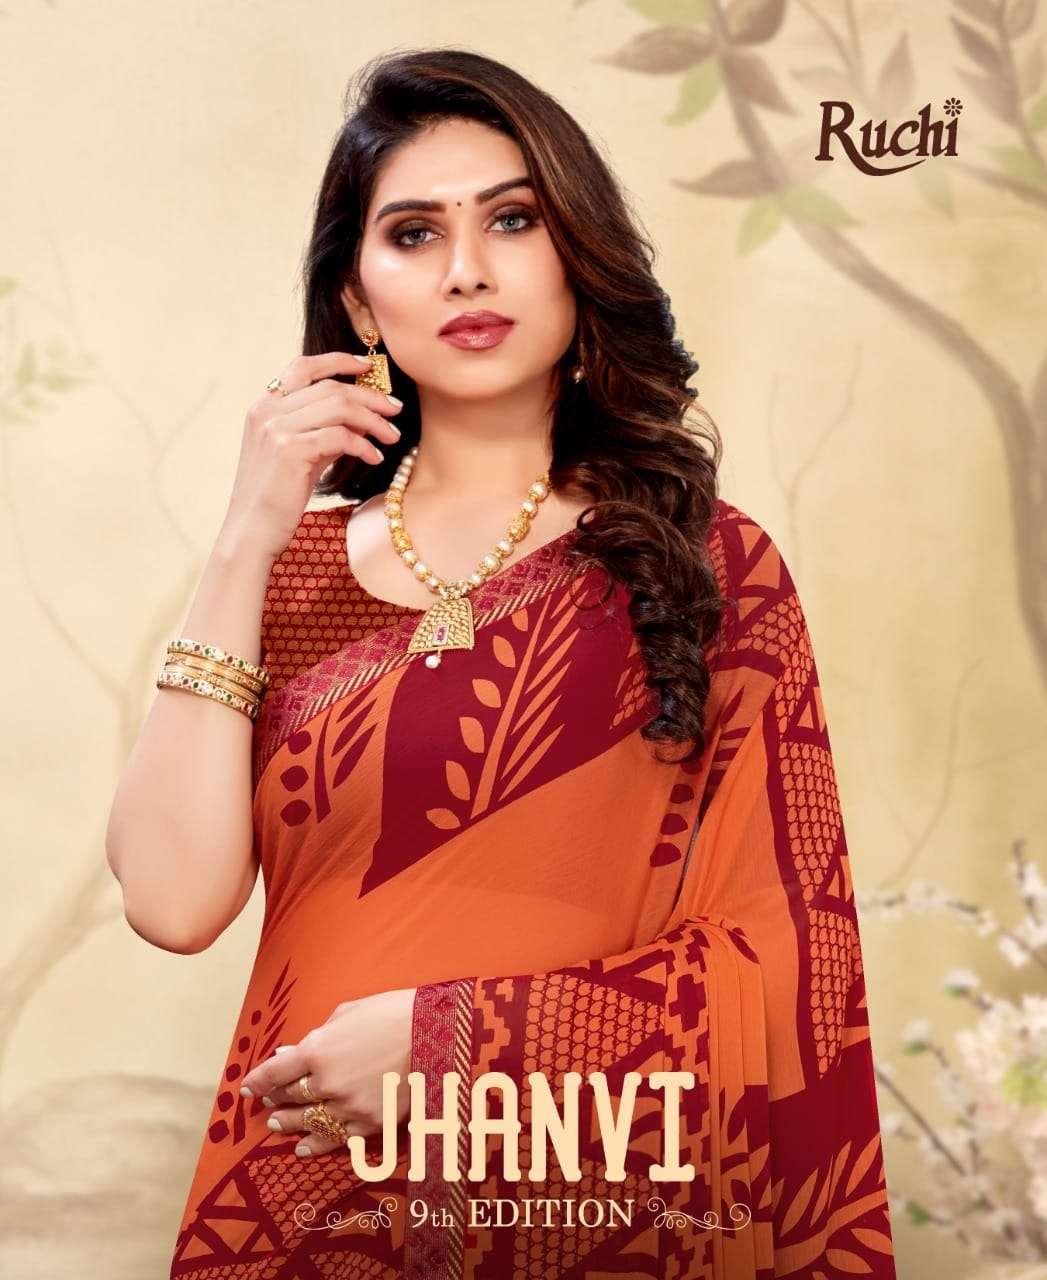 Ruchi Sarees Jhanvi Vol 9 Chiffon Print Saree Collection Dealer